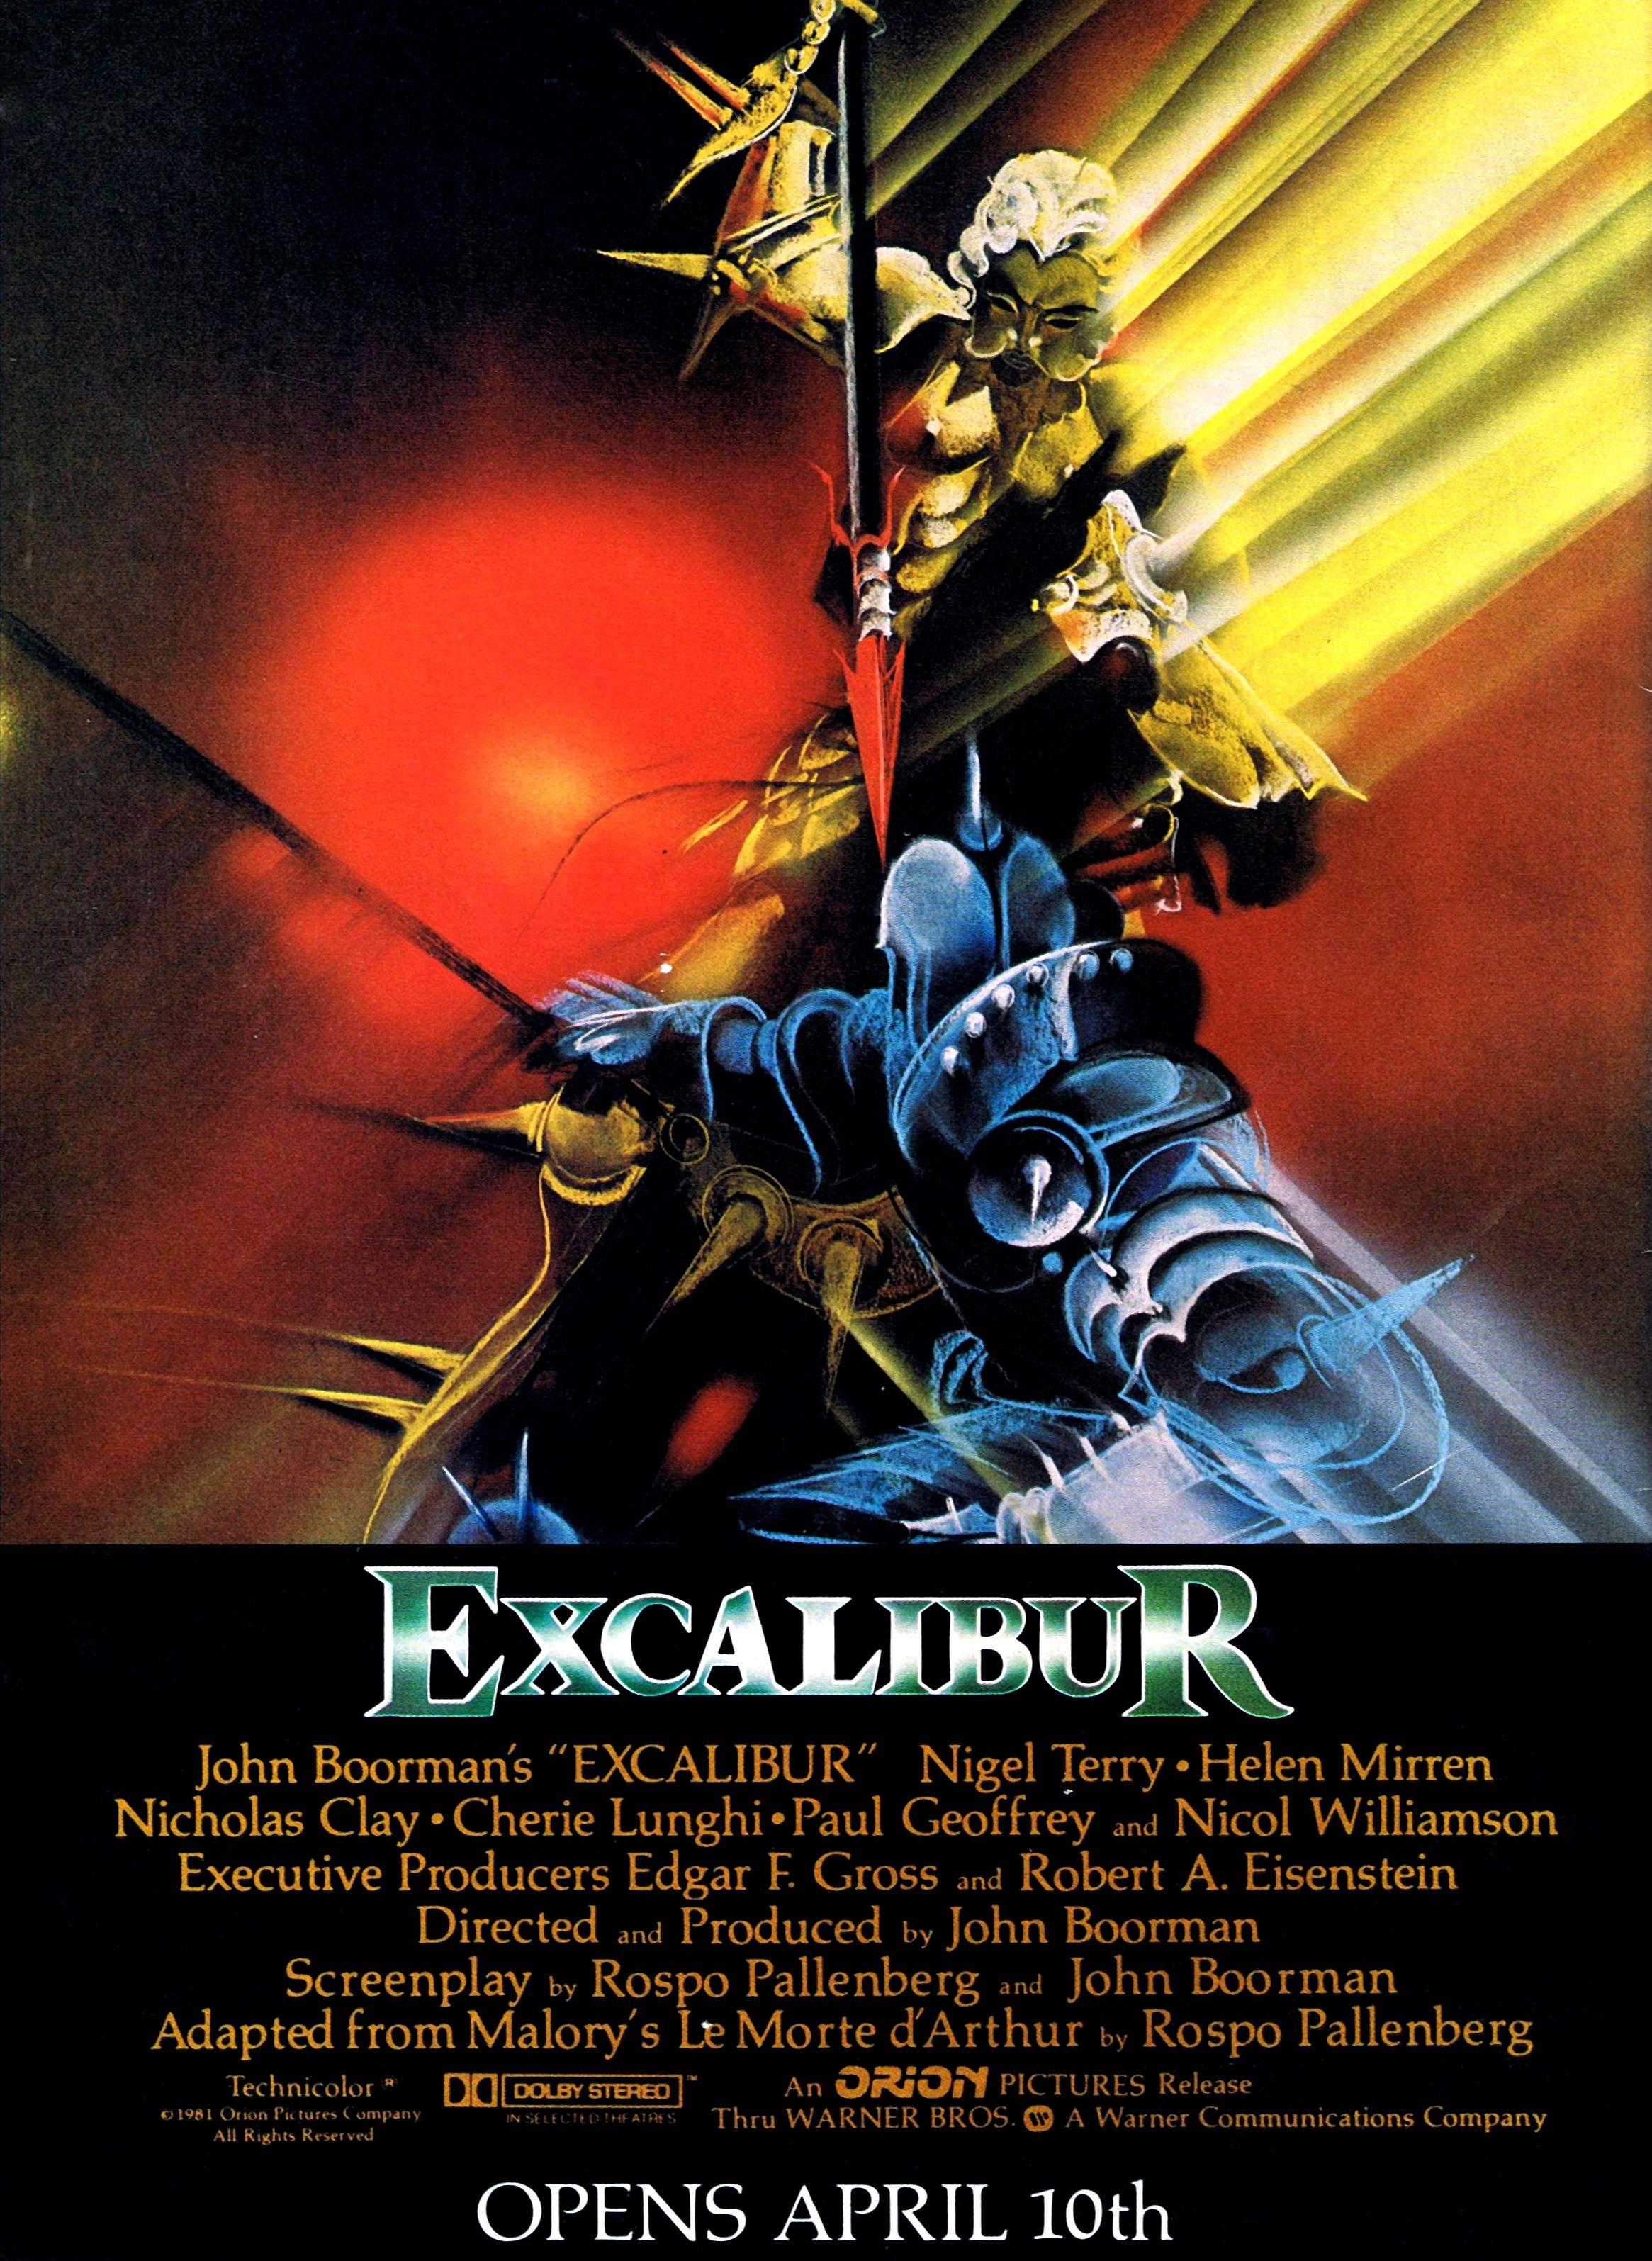 Excalibur 1981 Vintageads Ads Vintage Printad Tvads Advertising Brandscience Influence Online Facebook Excalibur Adventure Romance Comic Book Guy